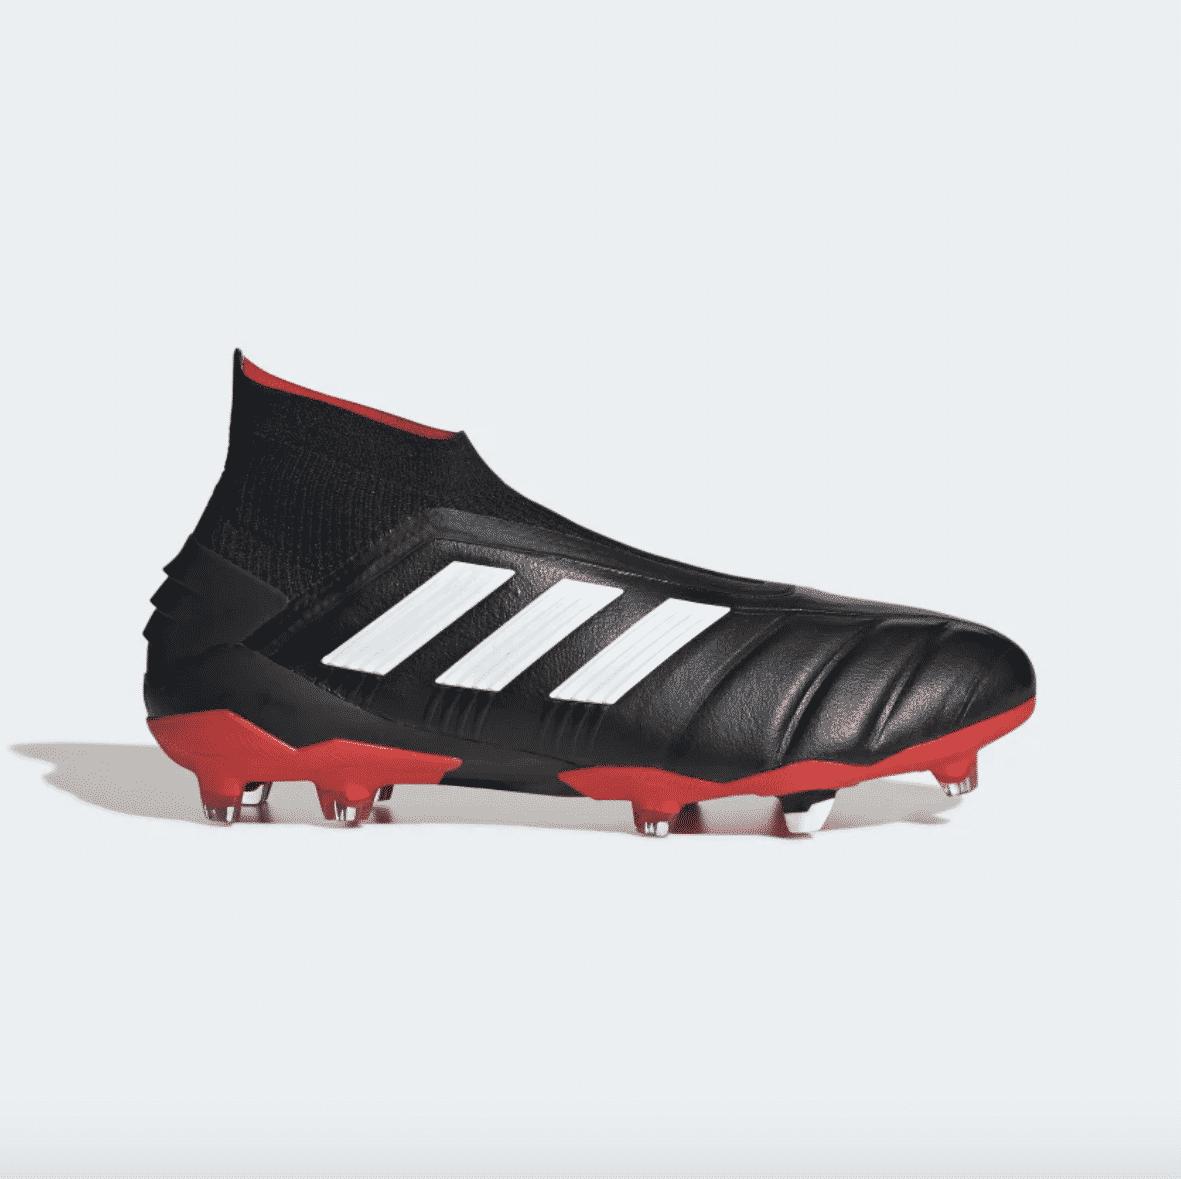 adidas-predator-19+-reedition-predator-mania-noir-7